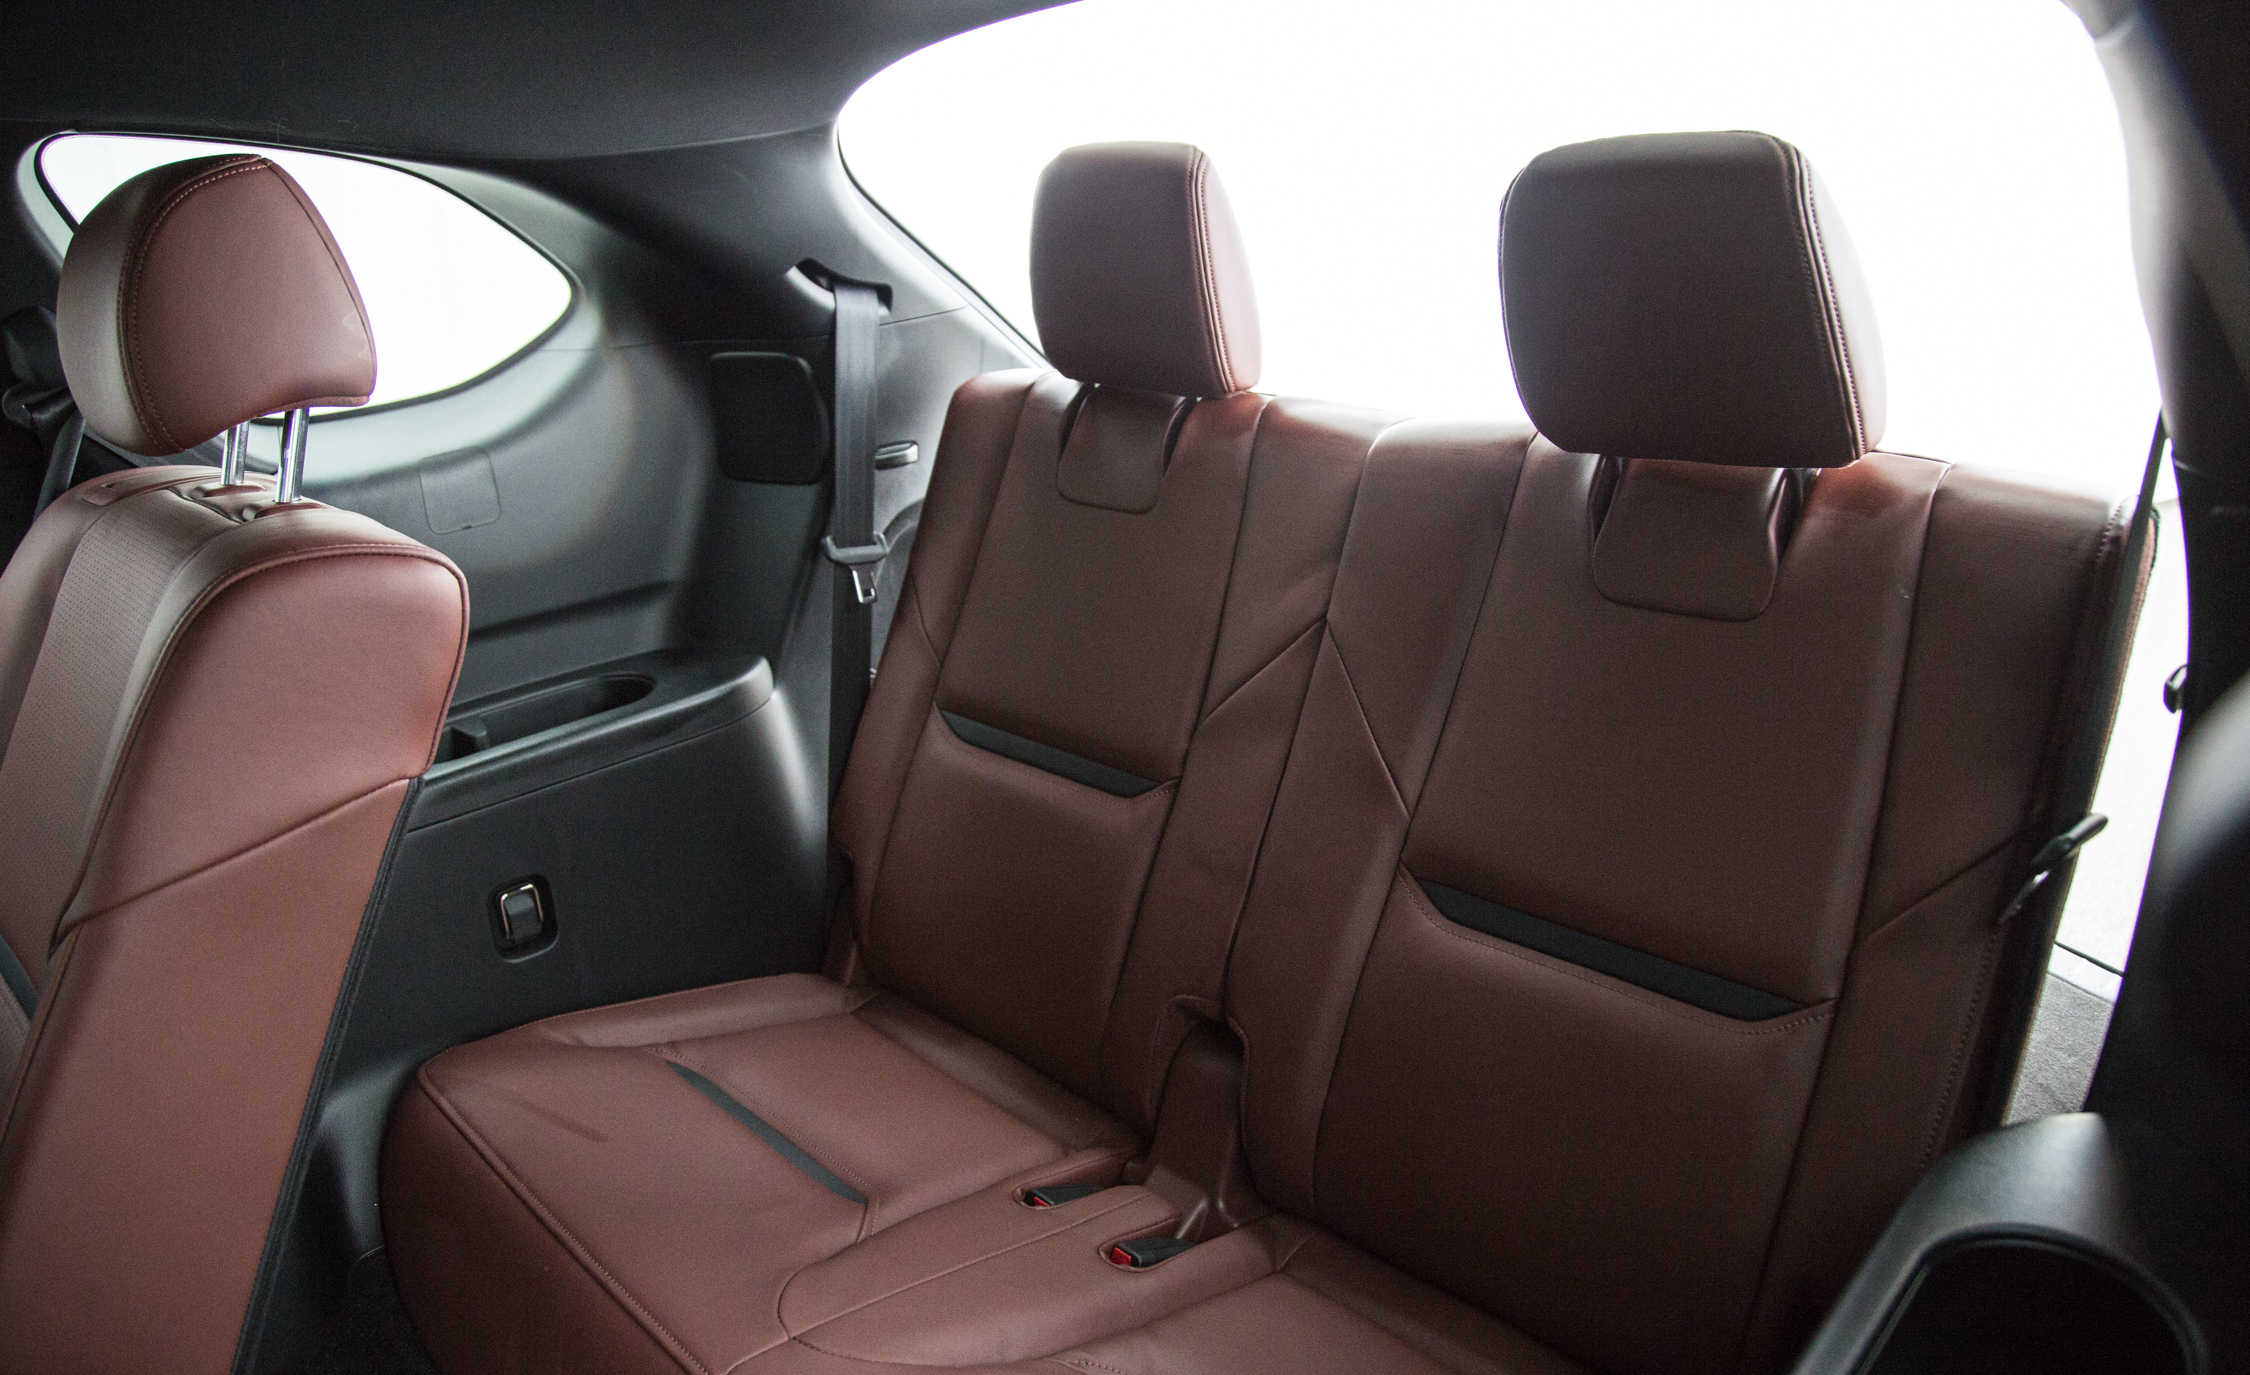 Mazda CX-9 2017 - салон, интерьер